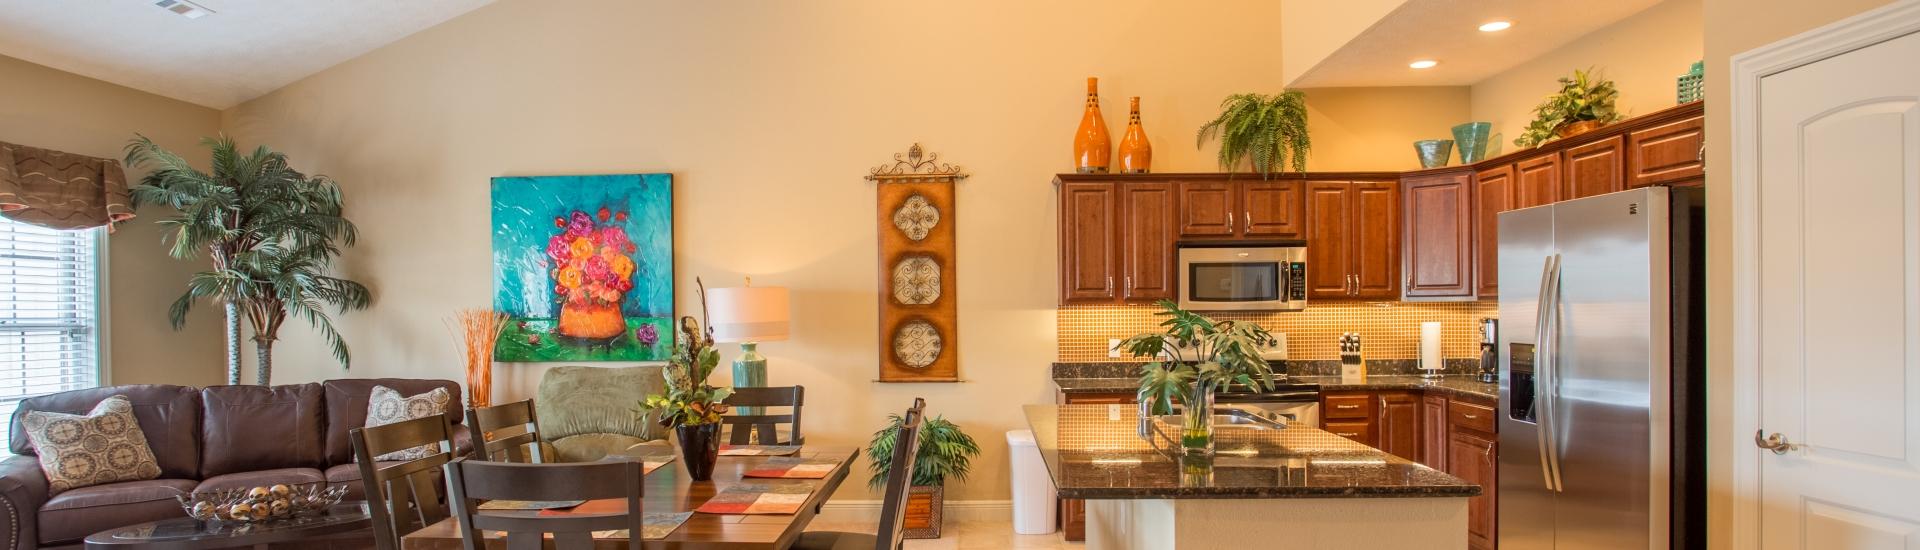 4 Bedroom Condo Rentals In Branson Call 1 800 504 0115 Branson Travel Office